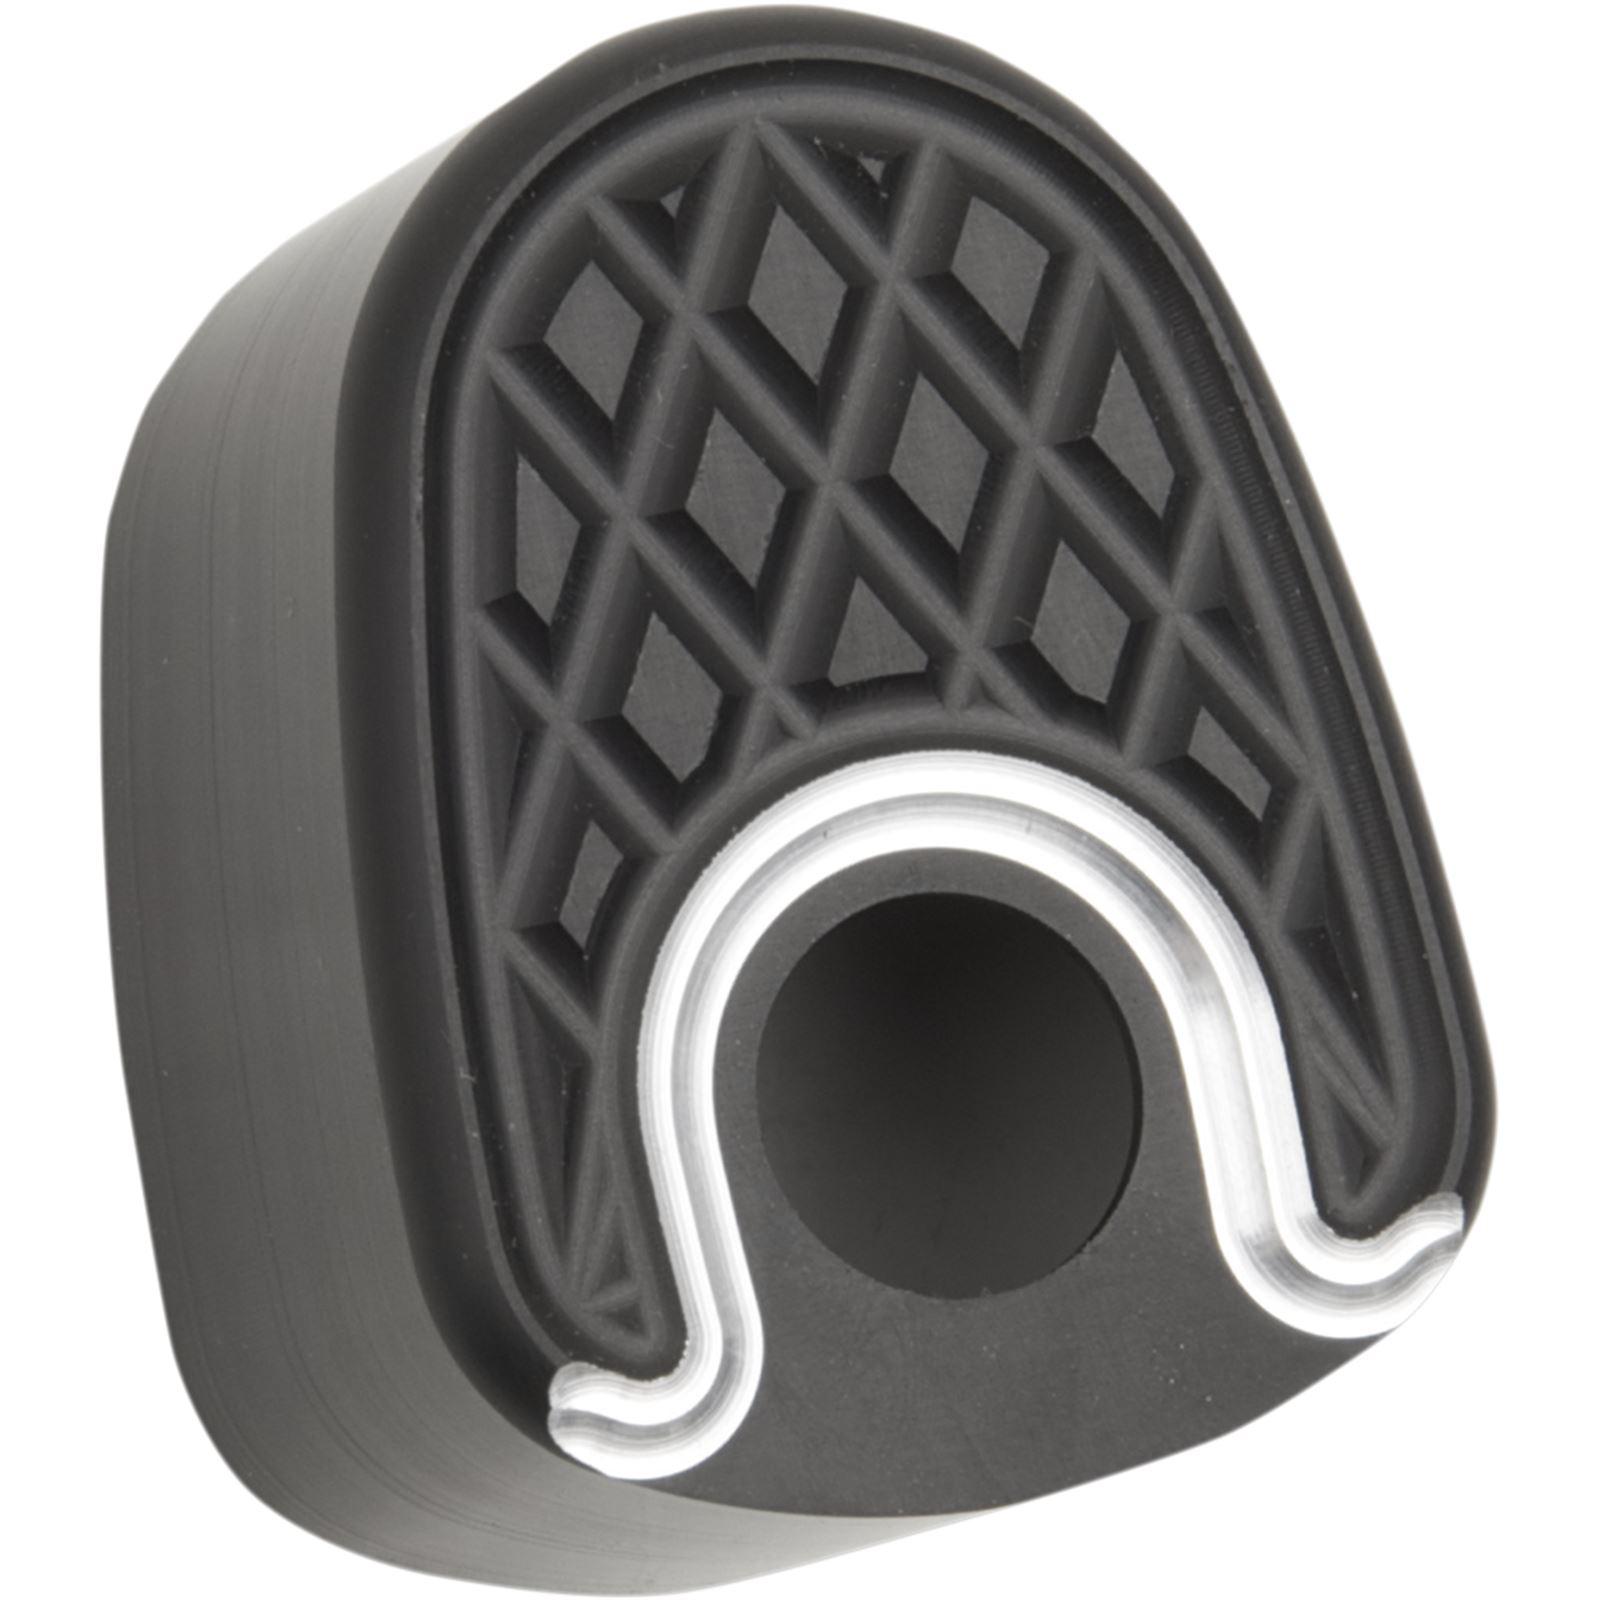 Eddie Trotta Designs Ignition Switch - Cover - Cross Cut - Black